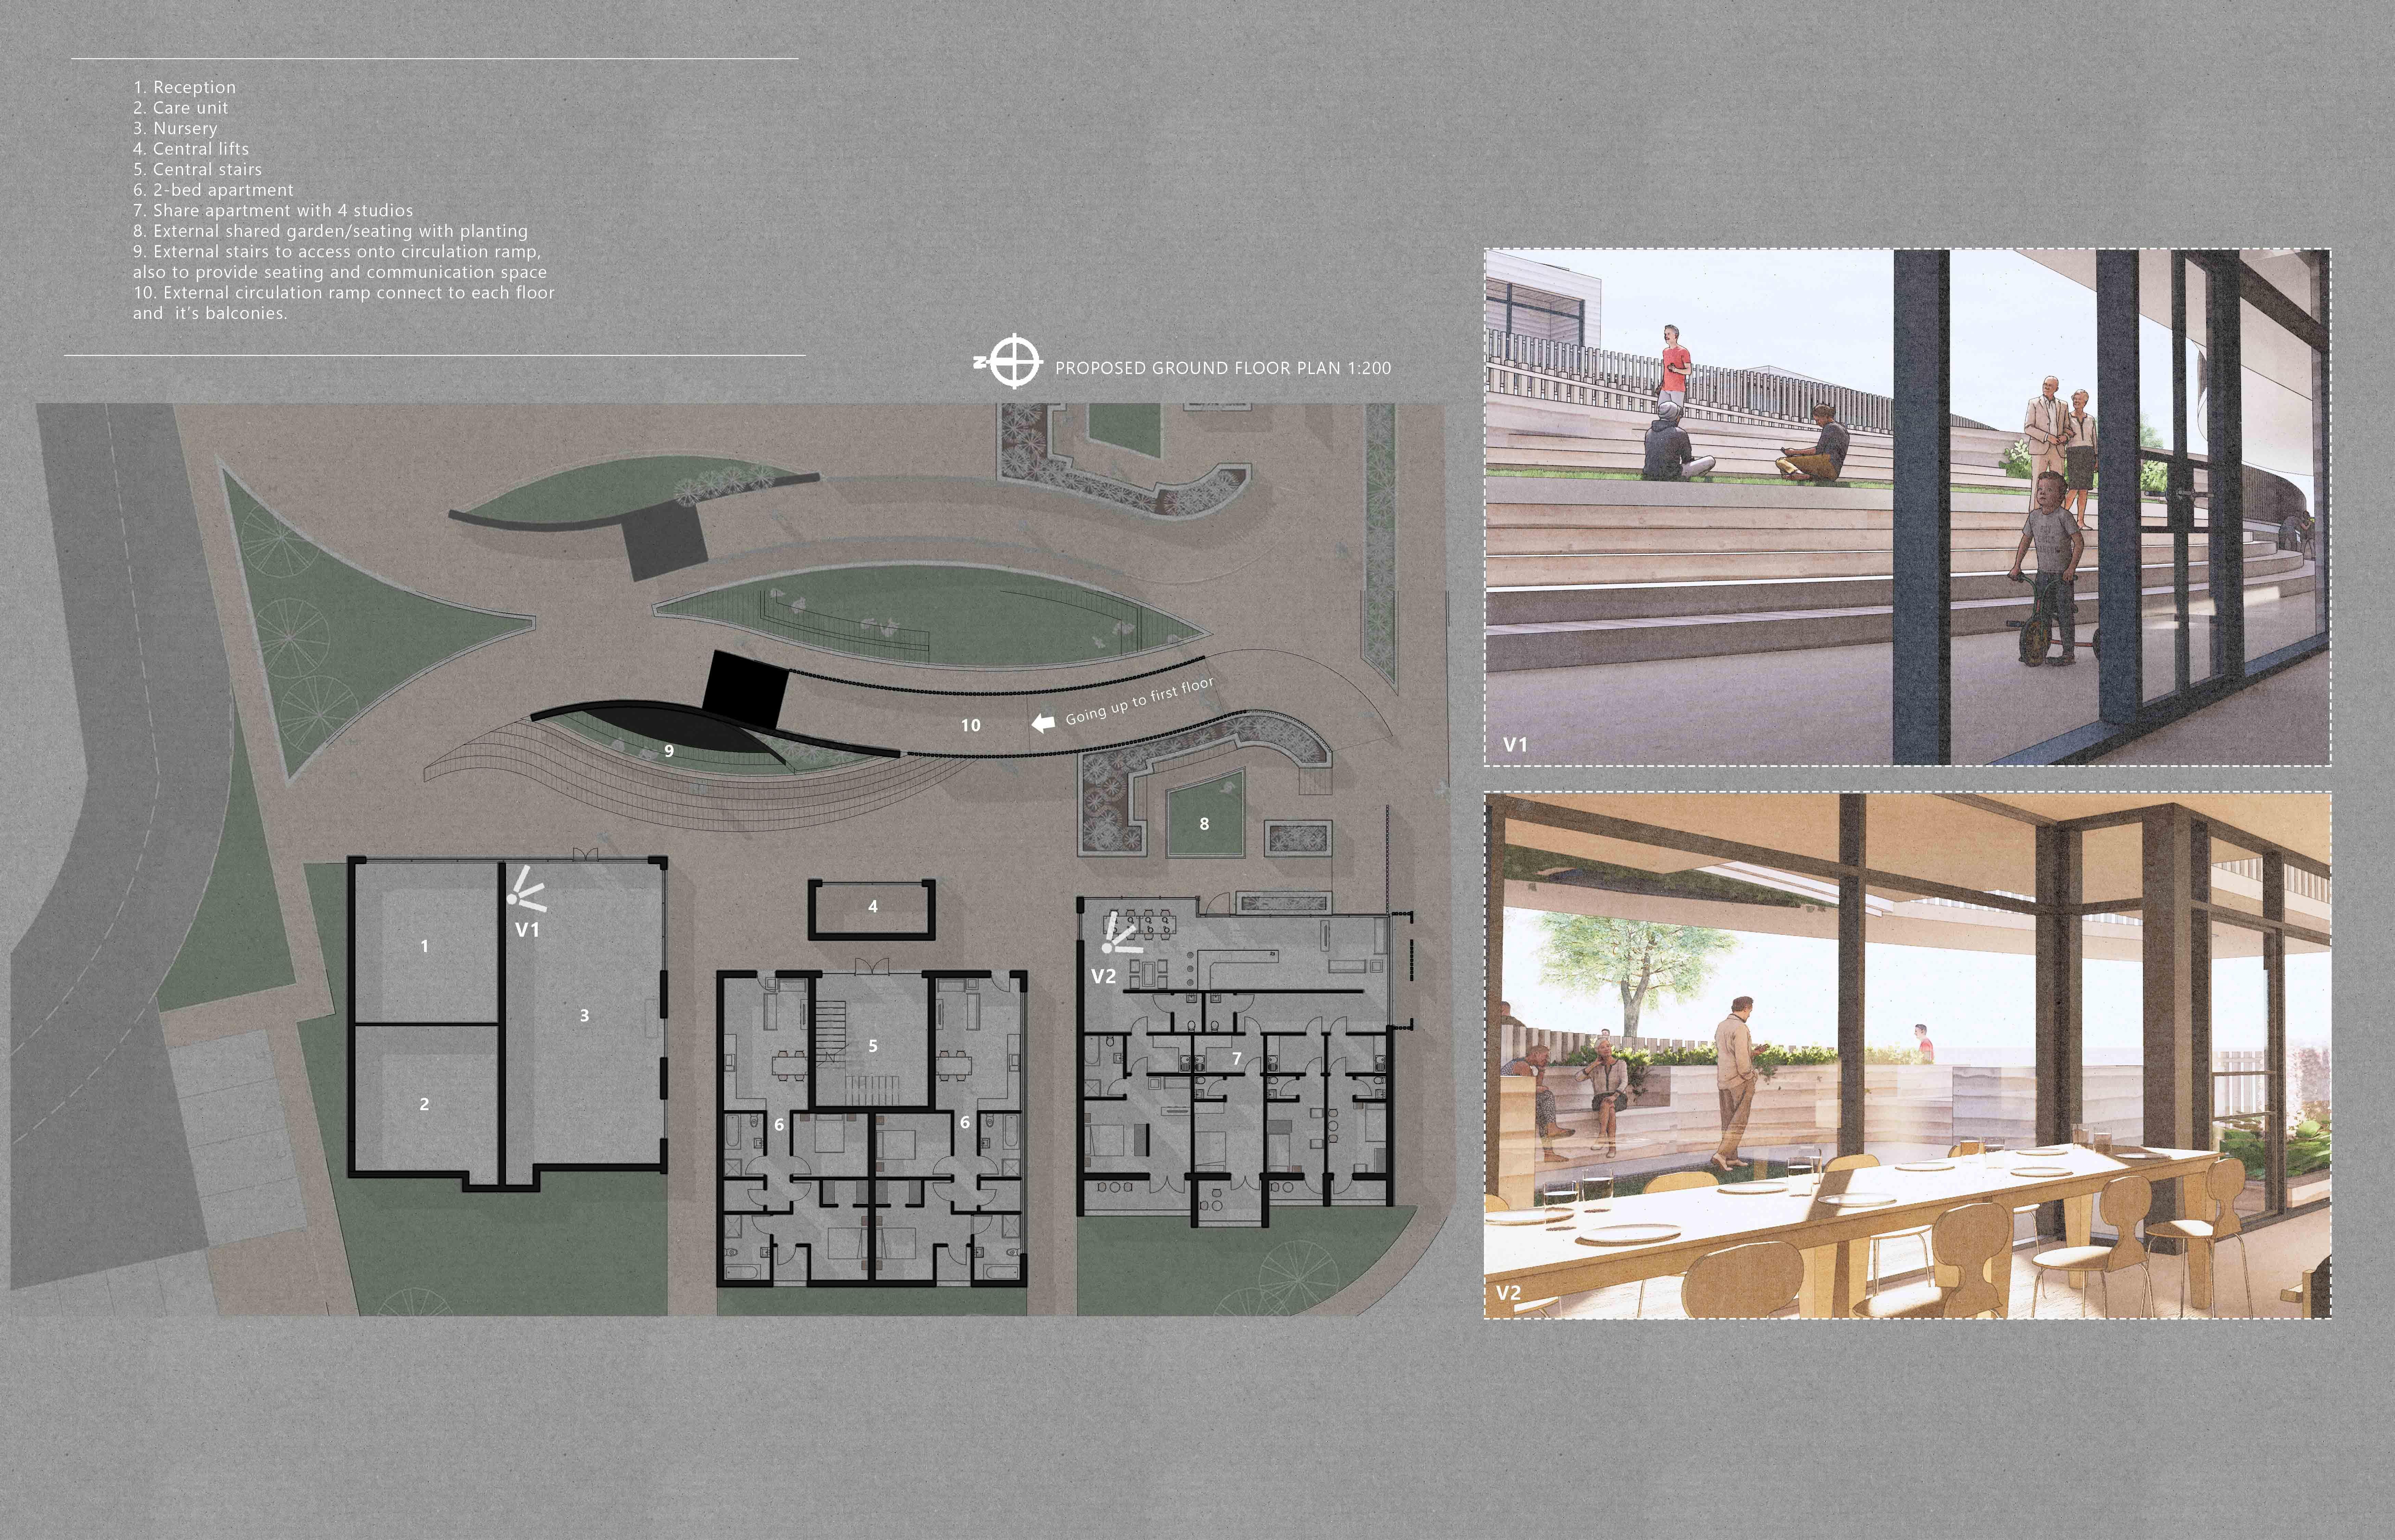 Proposed Ground Floor Plan.